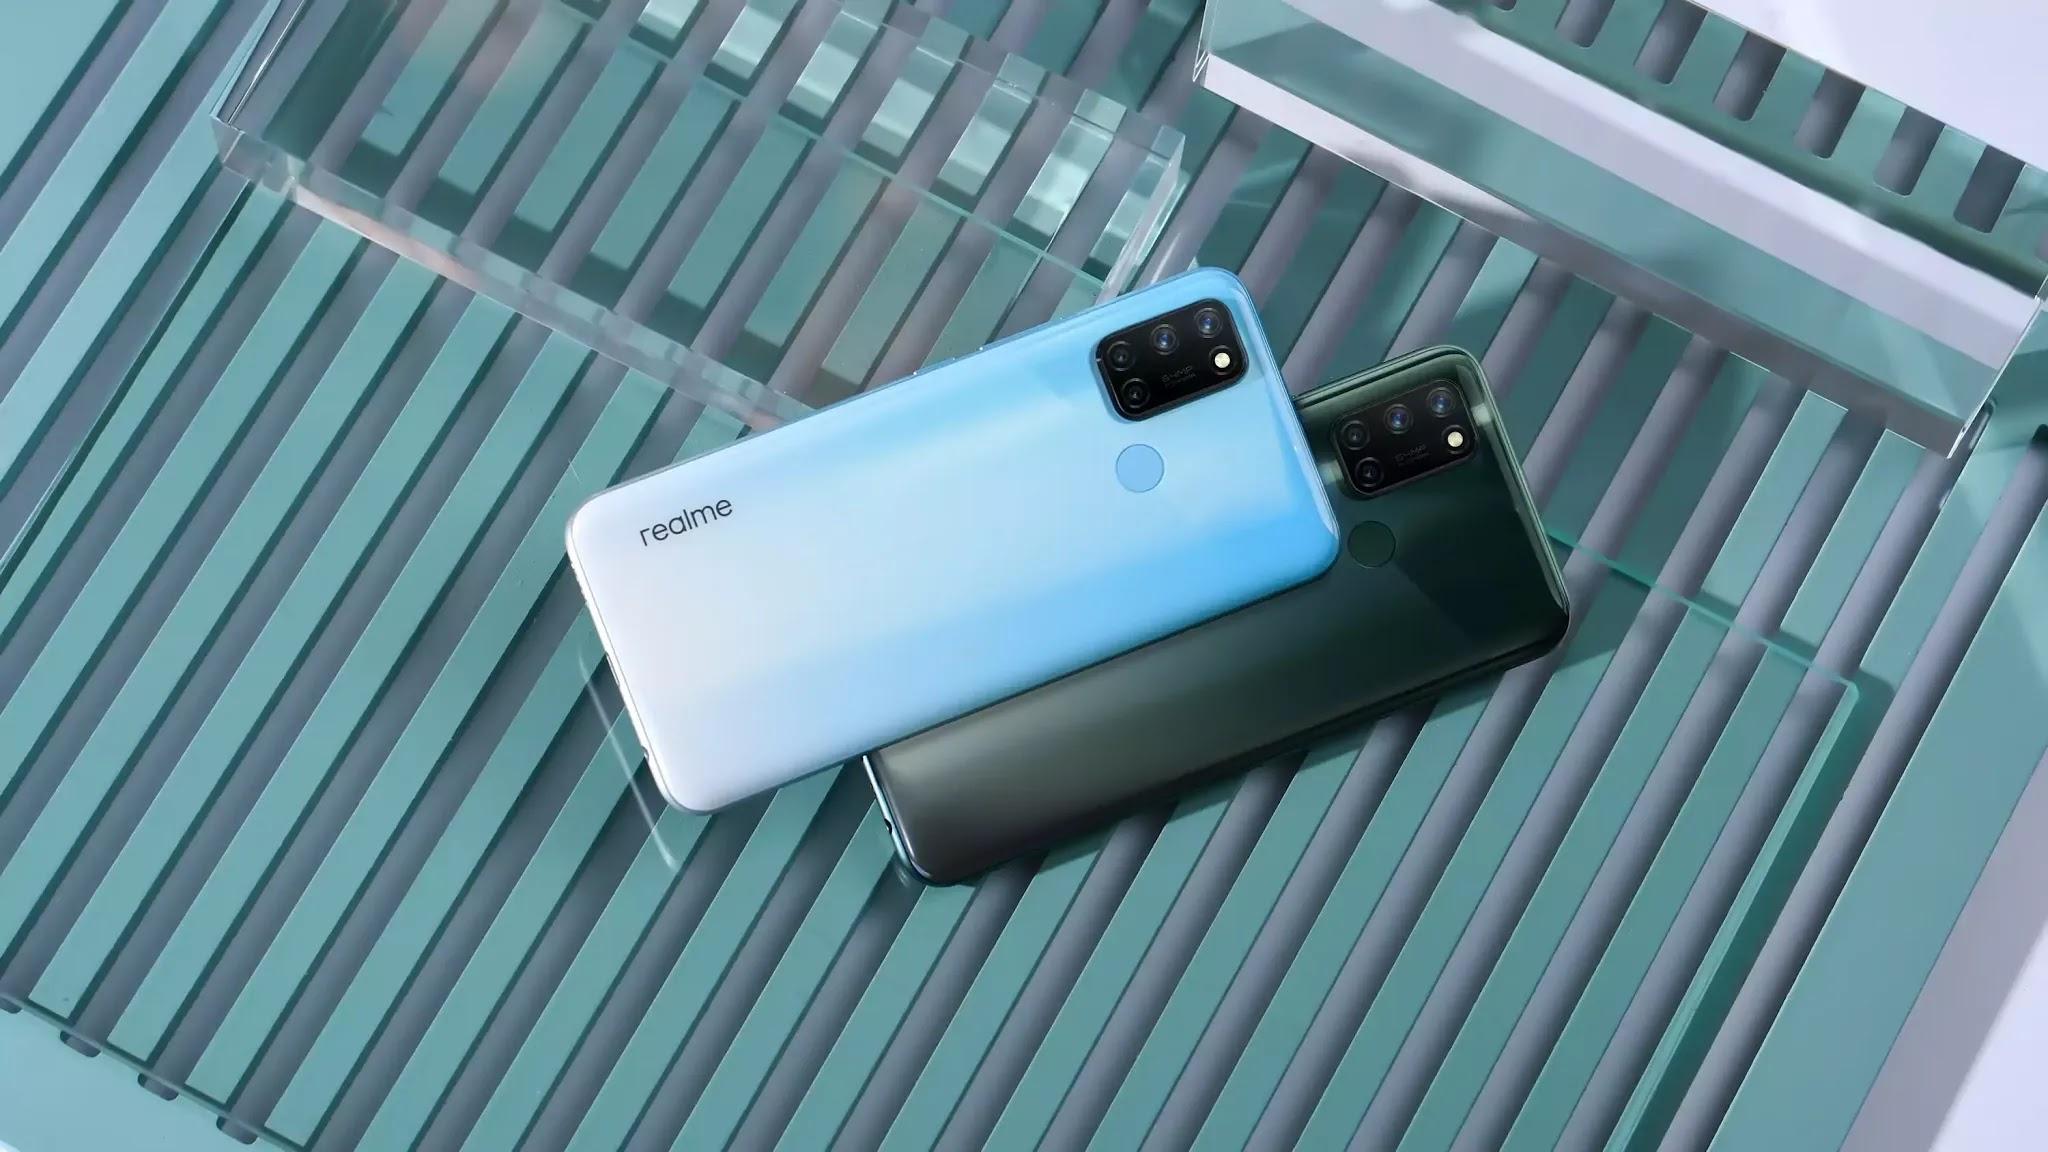 realme 7i - Polar Blue and Aurora Green